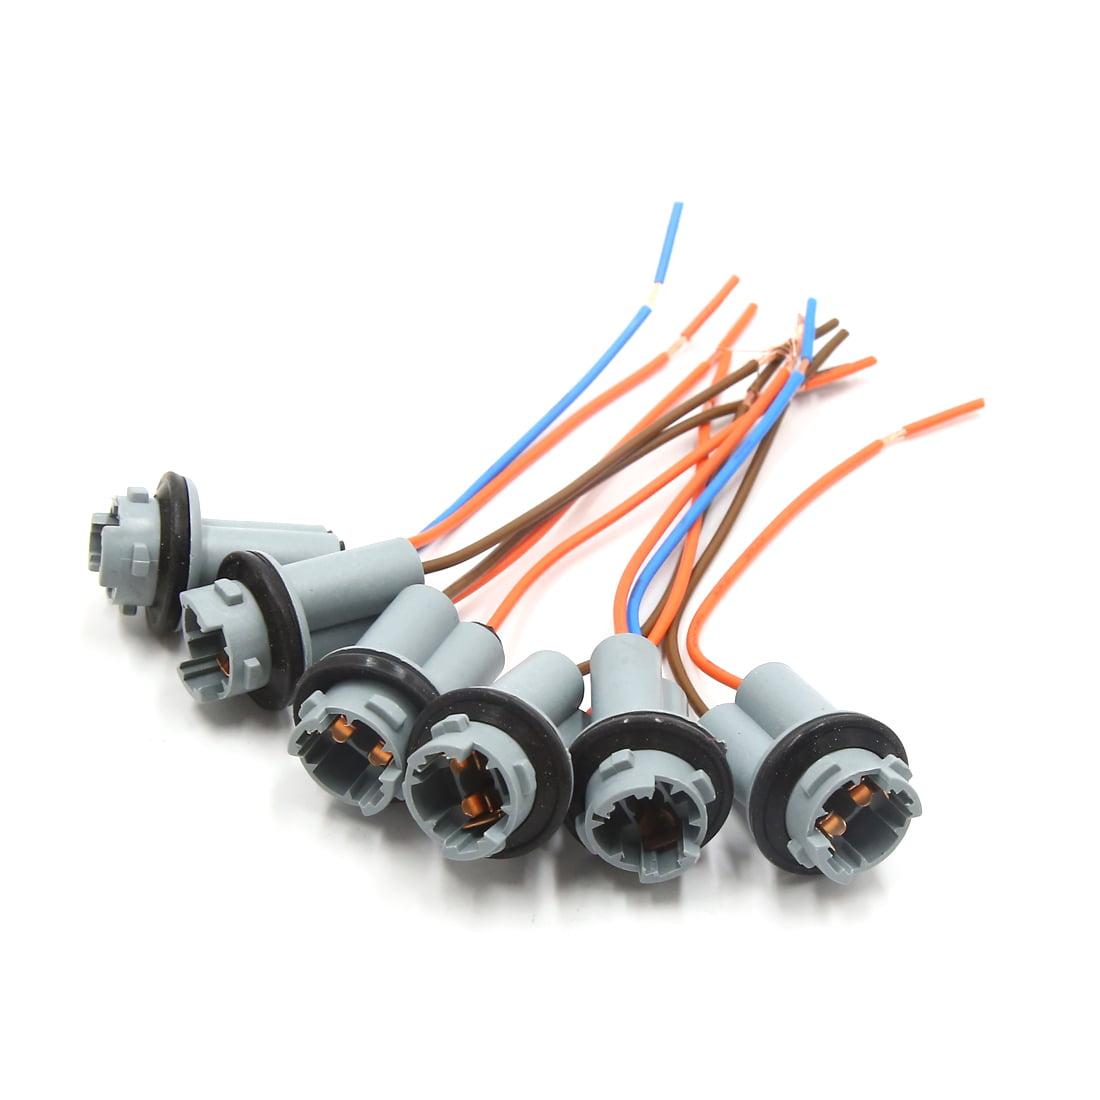 6Pcs T10 W5W 168 194 2 Wires Car Interior Light Bulb Extension Socket Connector